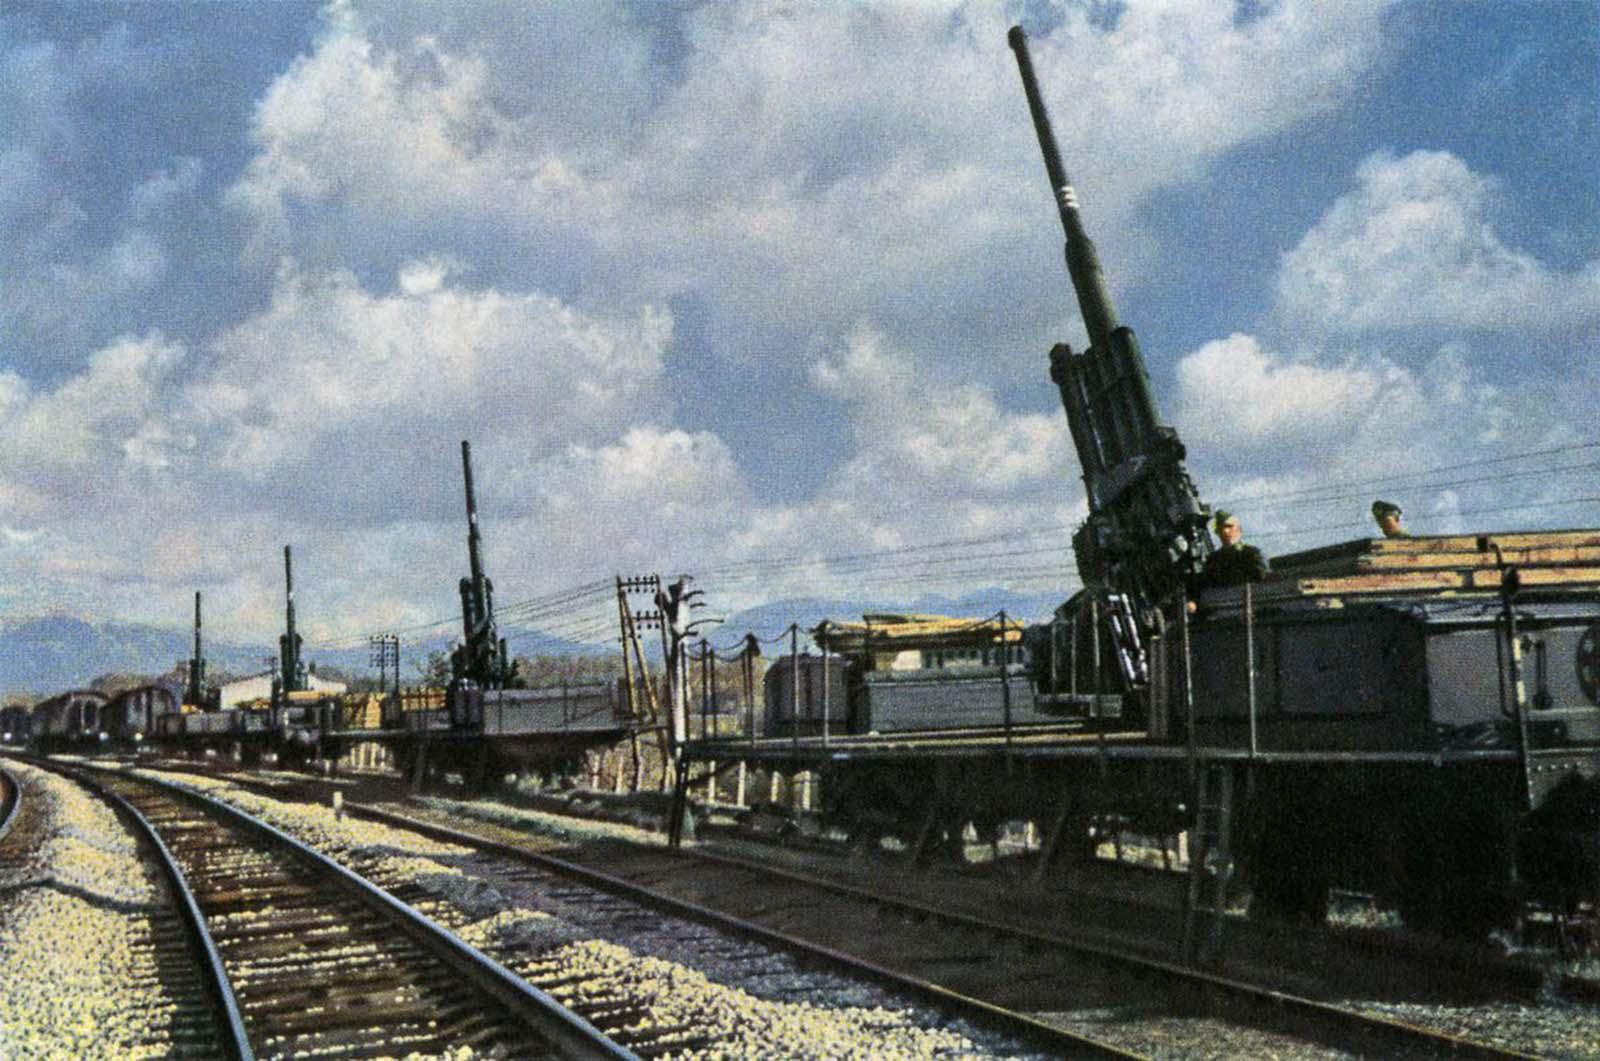 German railway guns used in World War II. 1940.